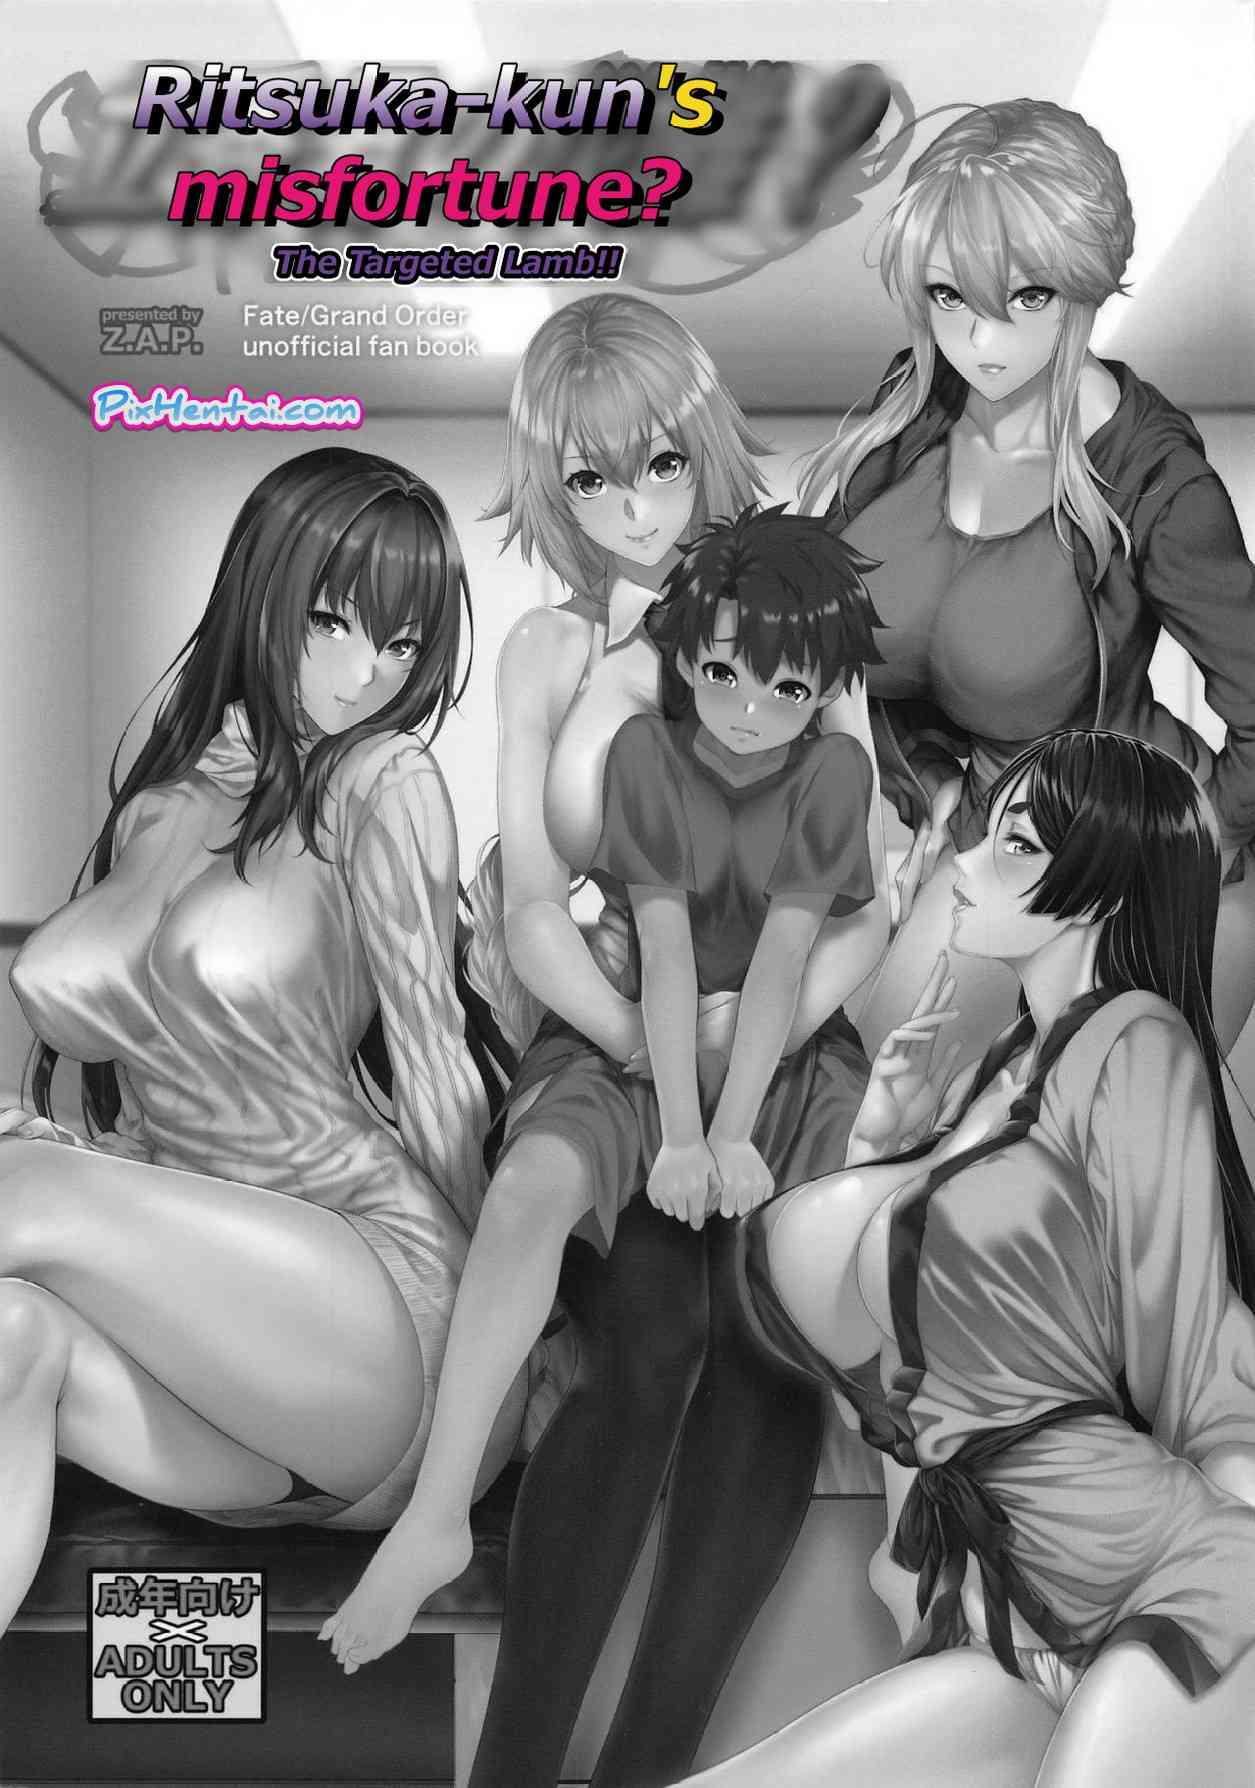 Komik Hentai Ritsuka-kun's Misfortune? The Targeted Lamb!! Manga Sex Porn Doujin XXX Bokep 02